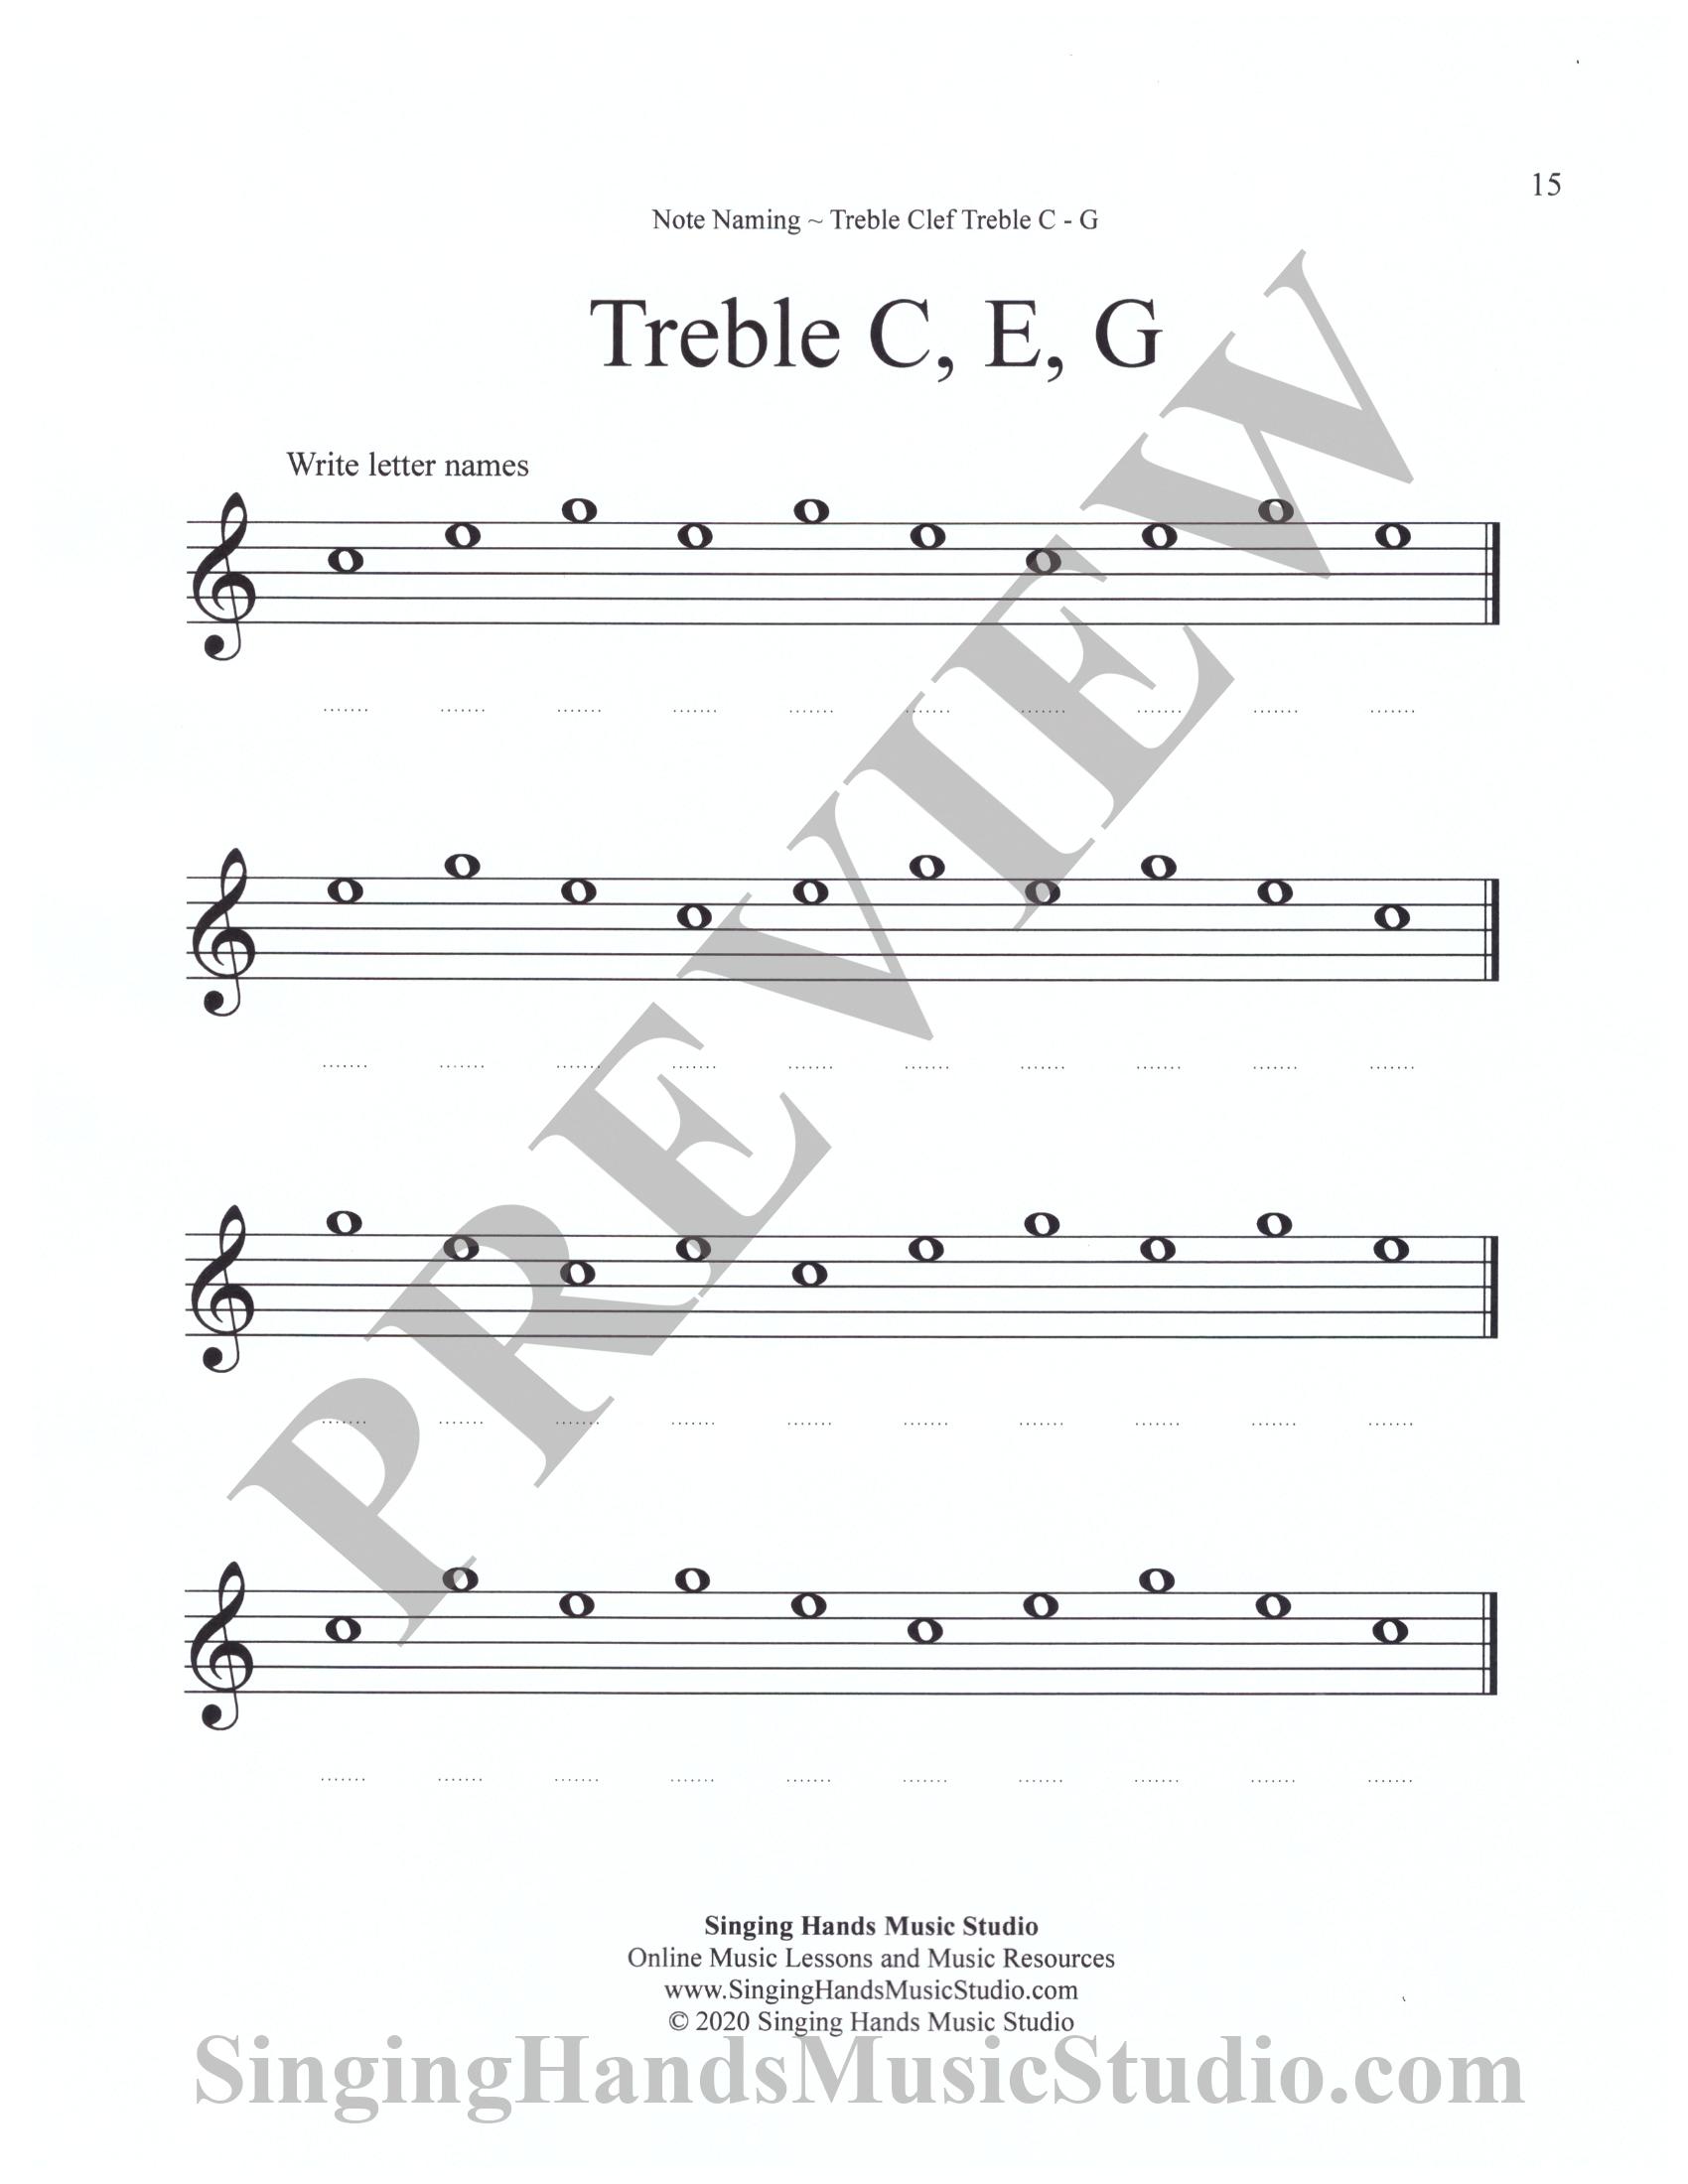 Note Naming Worksheets: Treble C – G – Singing Hands Music Studio Pertaining To Treble Clef Notes Worksheet